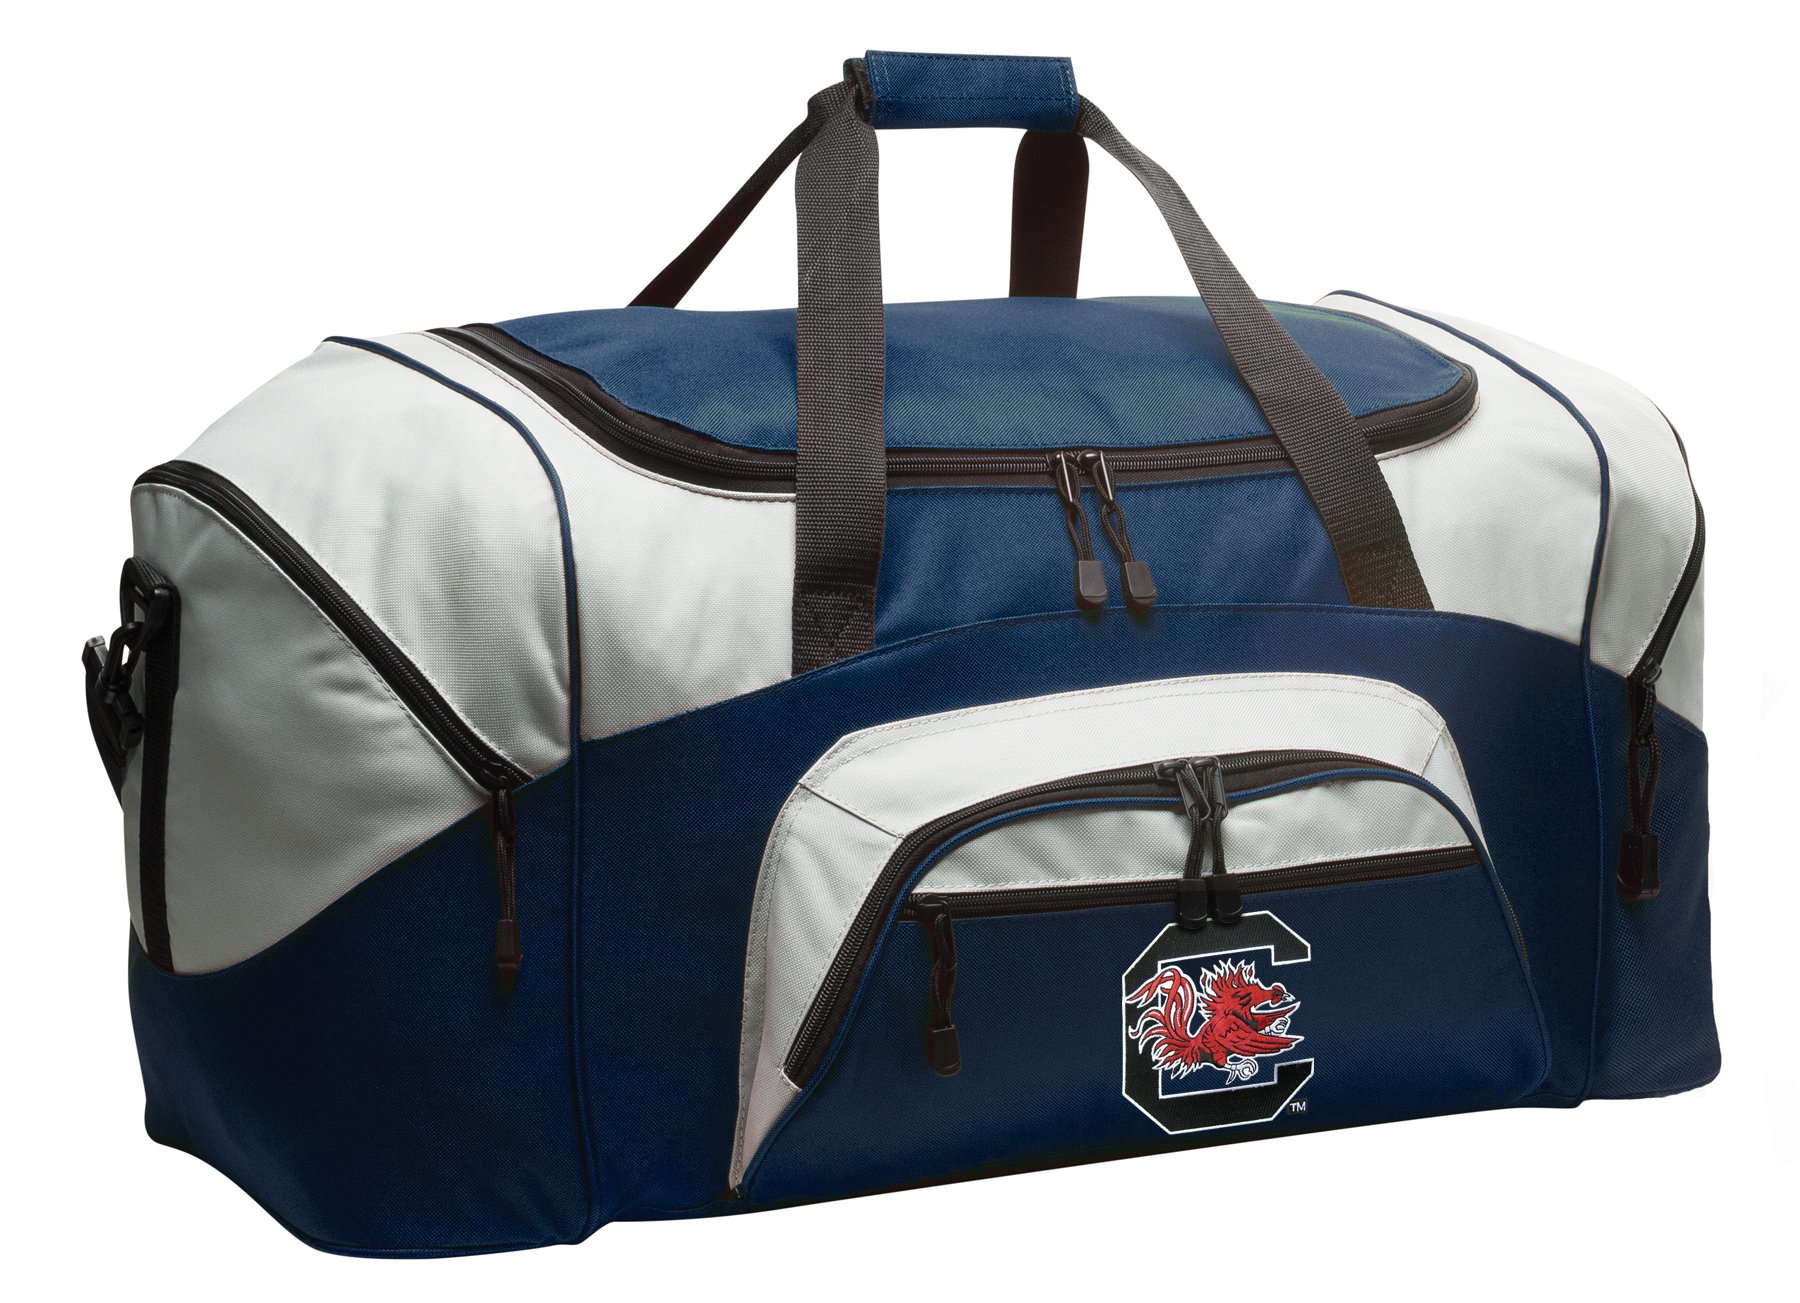 University of South Carolina Duffel Bag South Carolina Gamecocks Gym Bags or Luggage